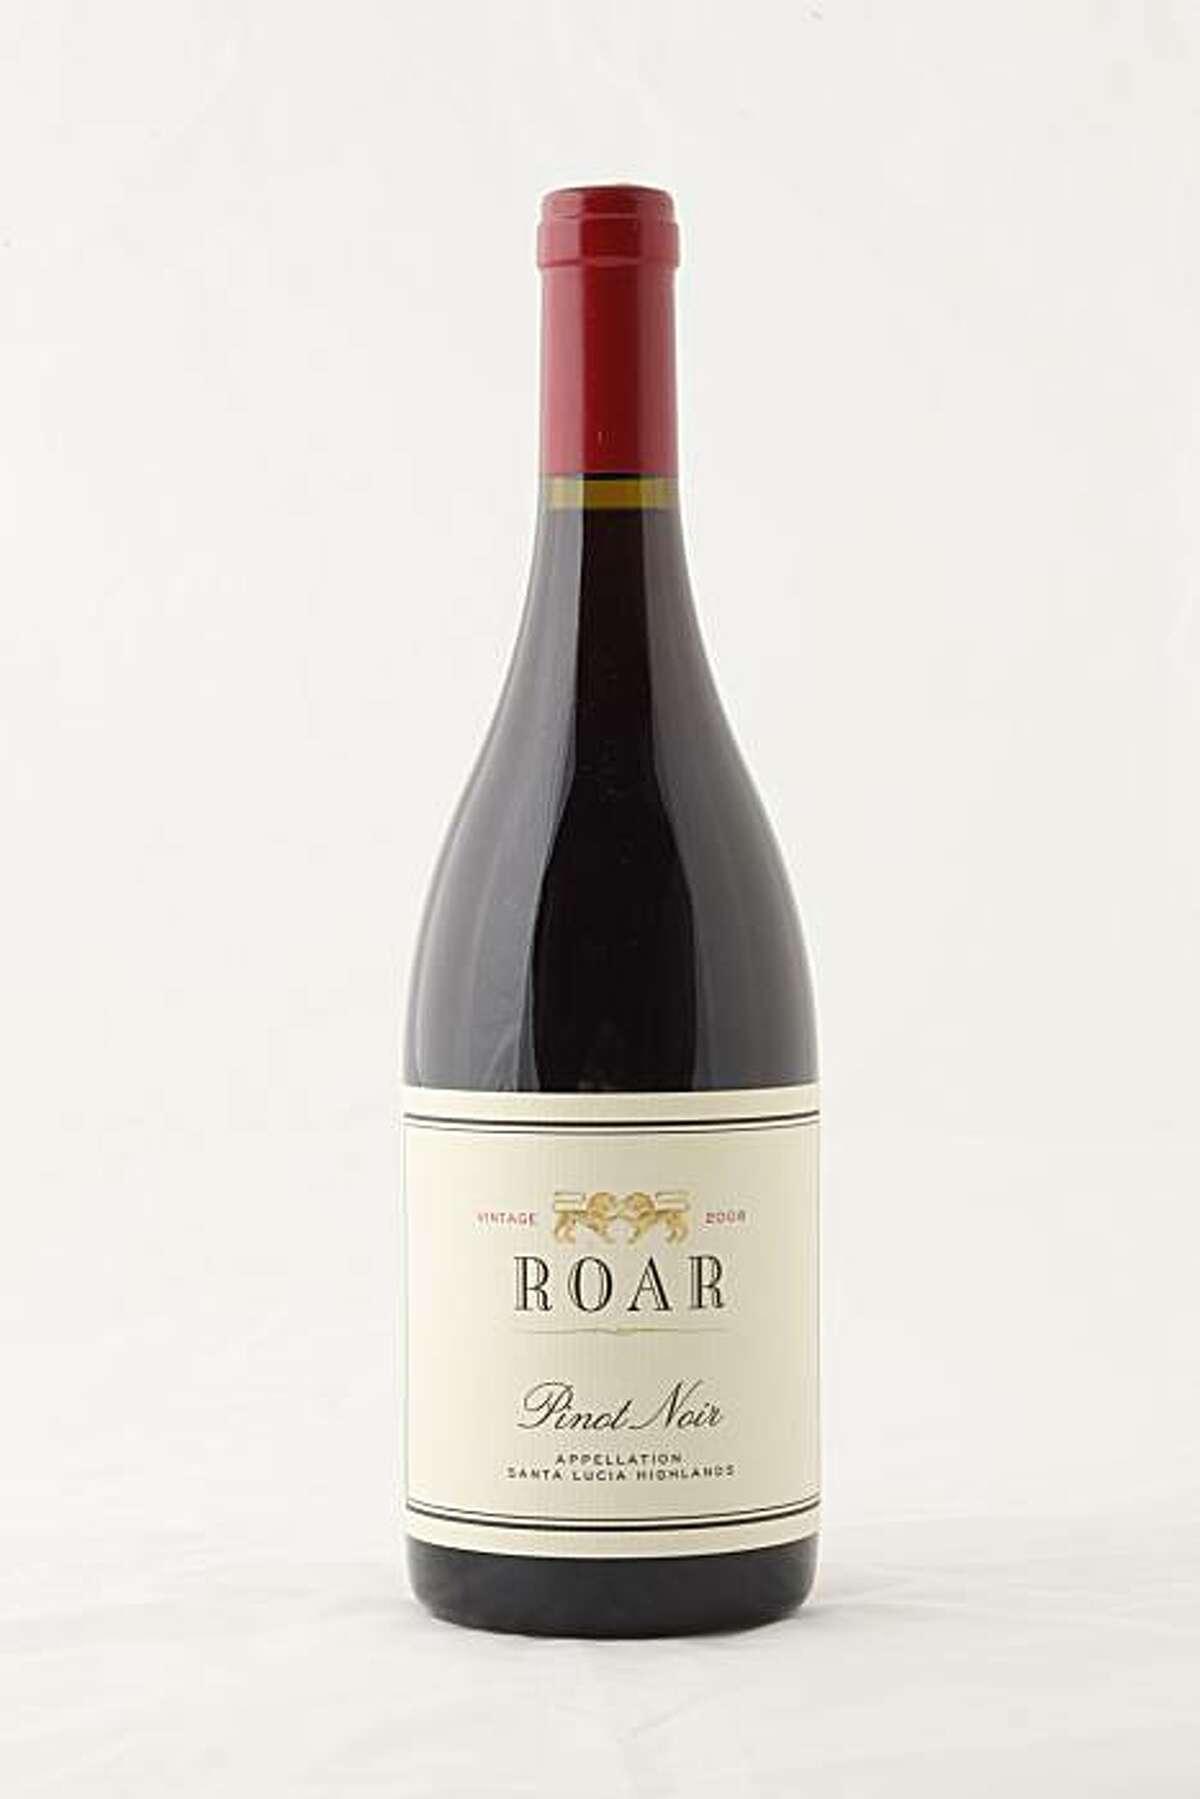 2008 Roar Wines Santa Lucia Highlands Pinot Noir in San Francisco, Calif., on July 14, 2010.